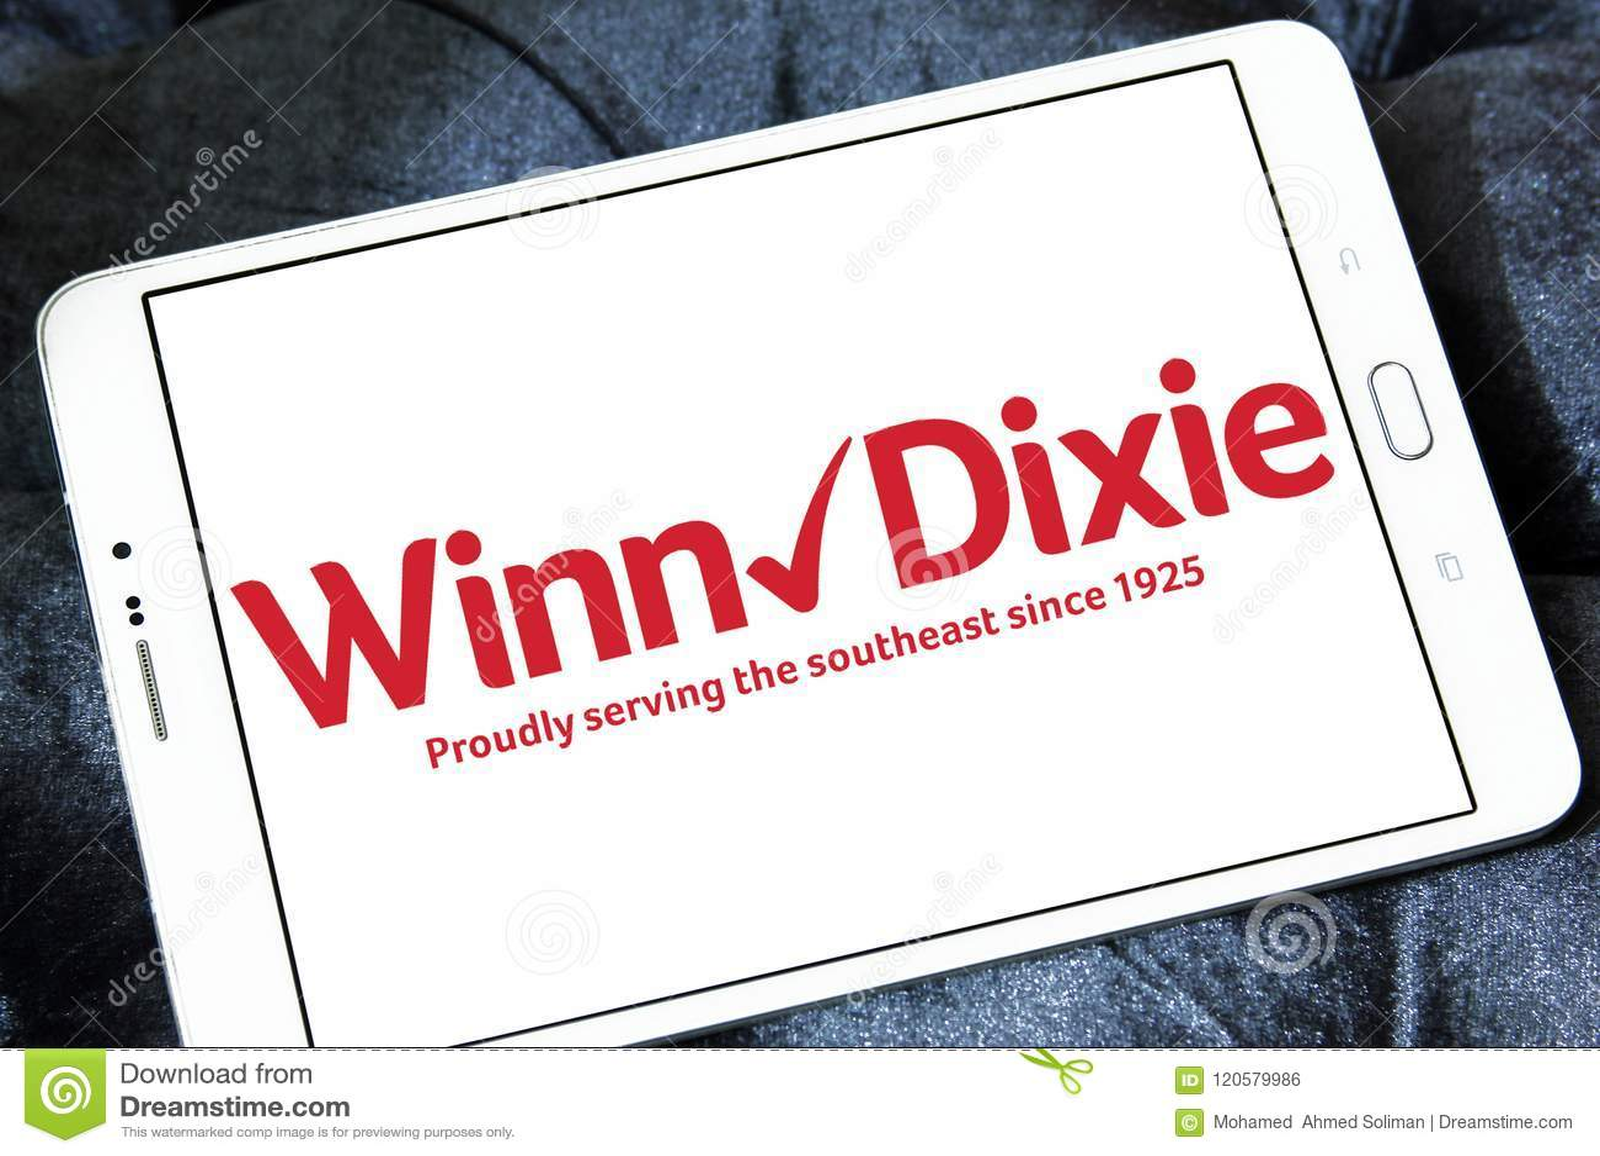 Winn-Dixie Supermarket Chain Logo Editorial Photo - Image of